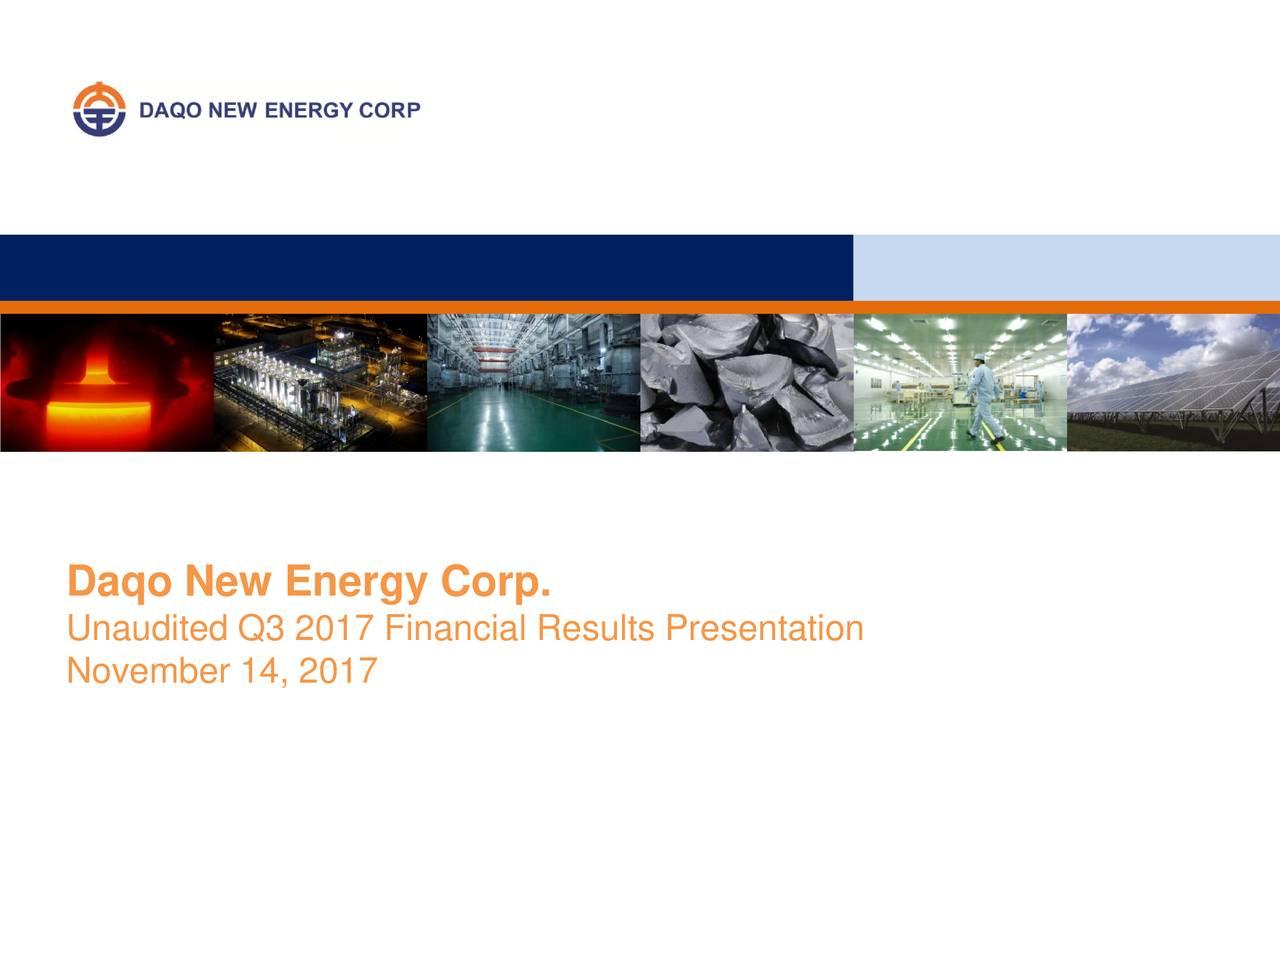 Daqo New Energy